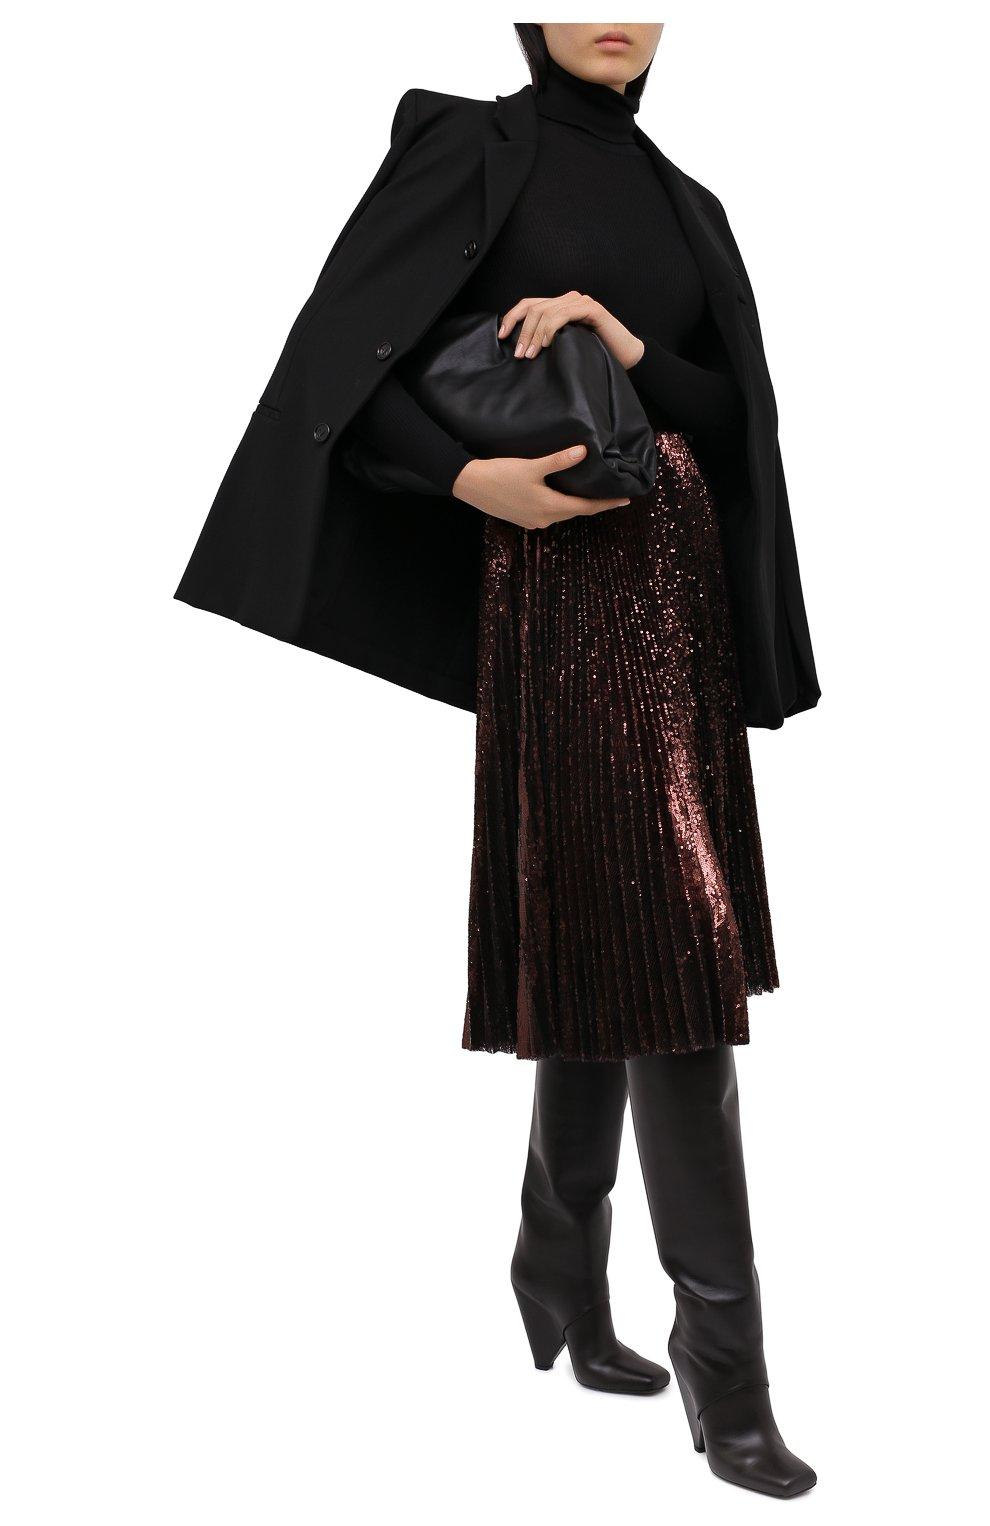 Женская юбка DOLCE & GABBANA бронзового цвета, арт. F4BYGT/FLMK4 | Фото 2